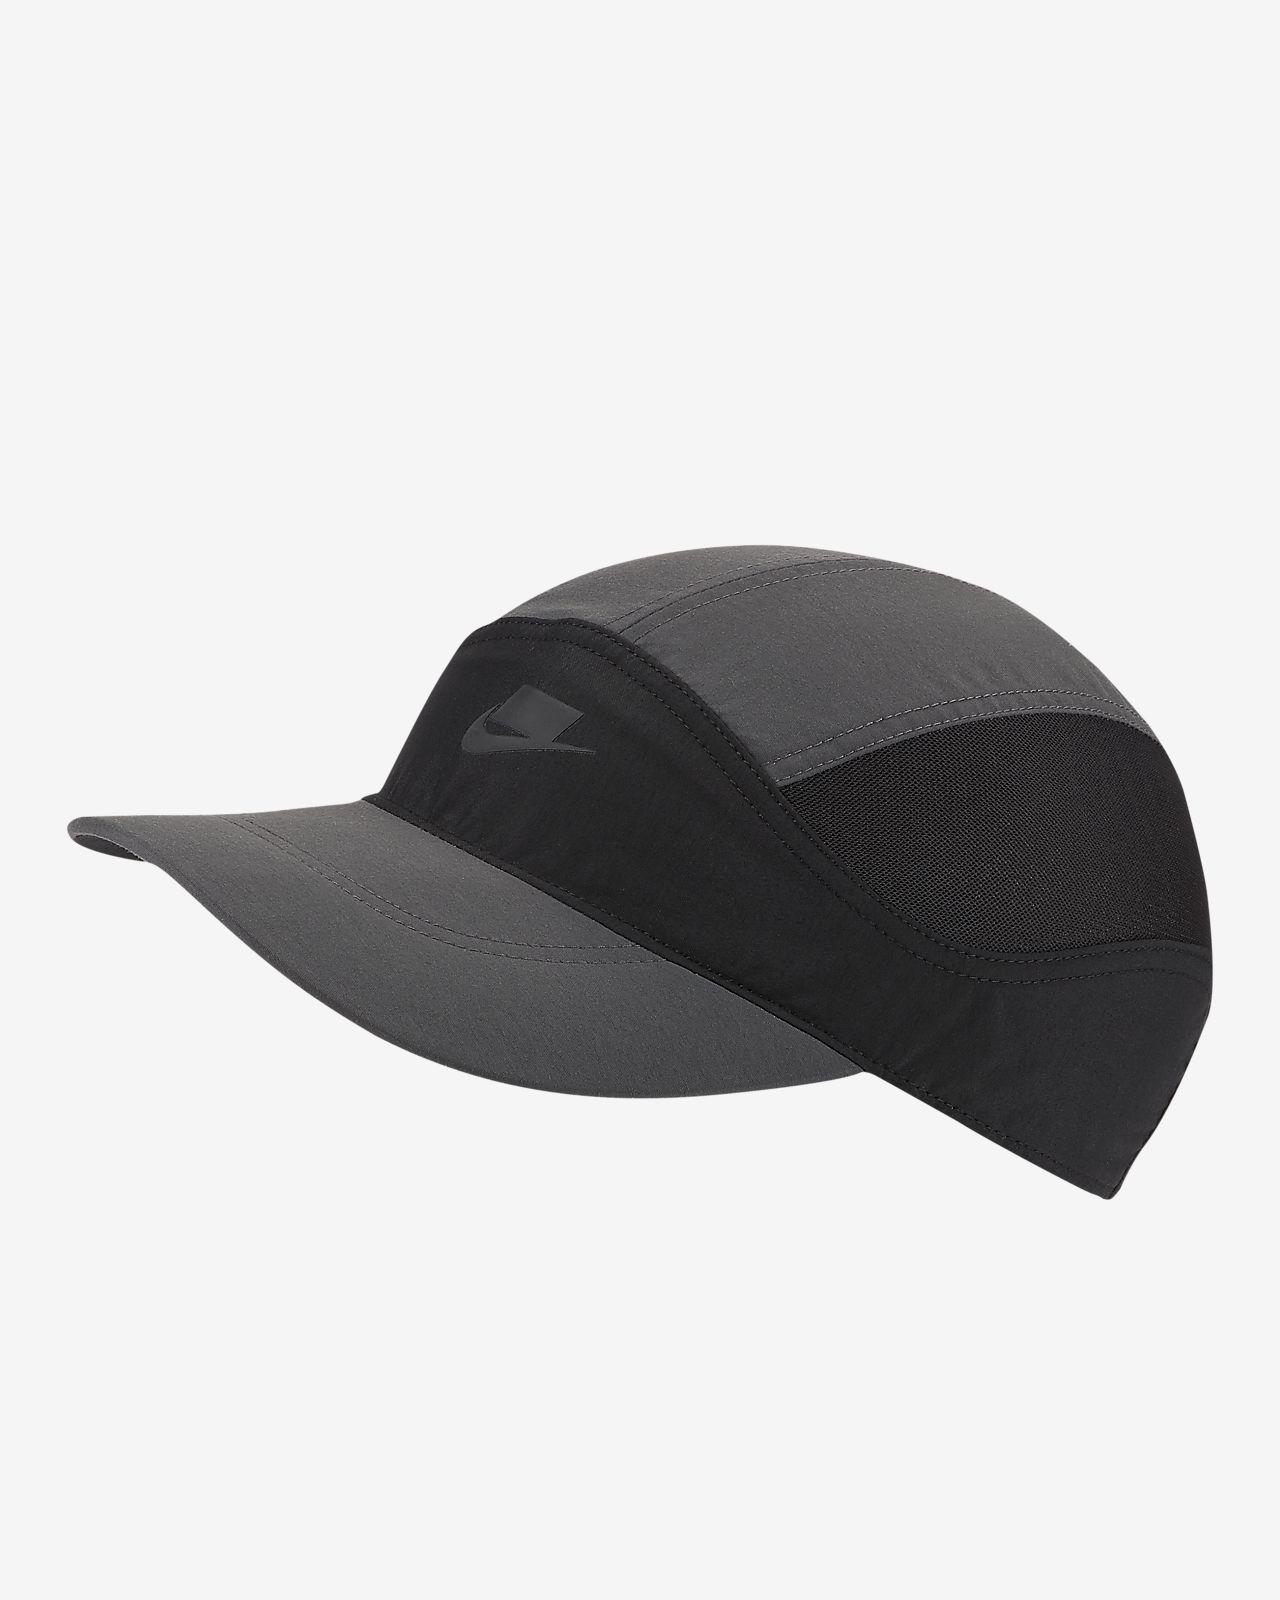 2ea712abcf883 Nike Sportswear Tailwind Checkered Hat. Nike.com